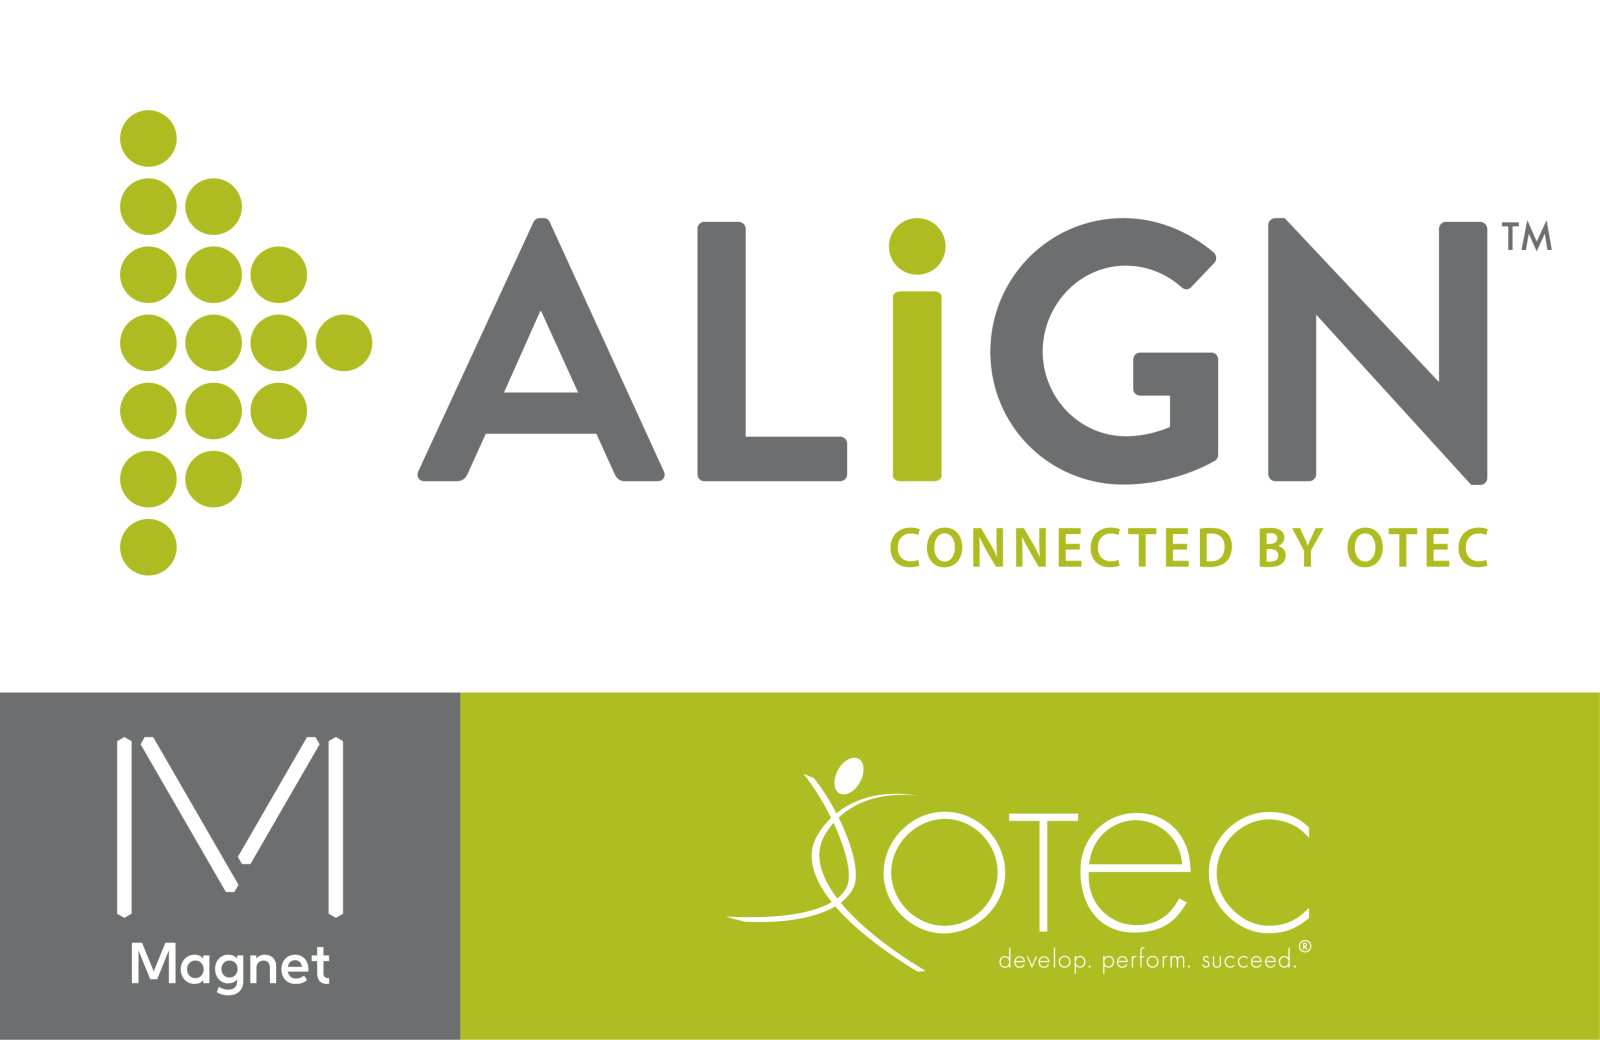 Retail - The ALiGN Network: Ottawa Employment Hub and OTEC